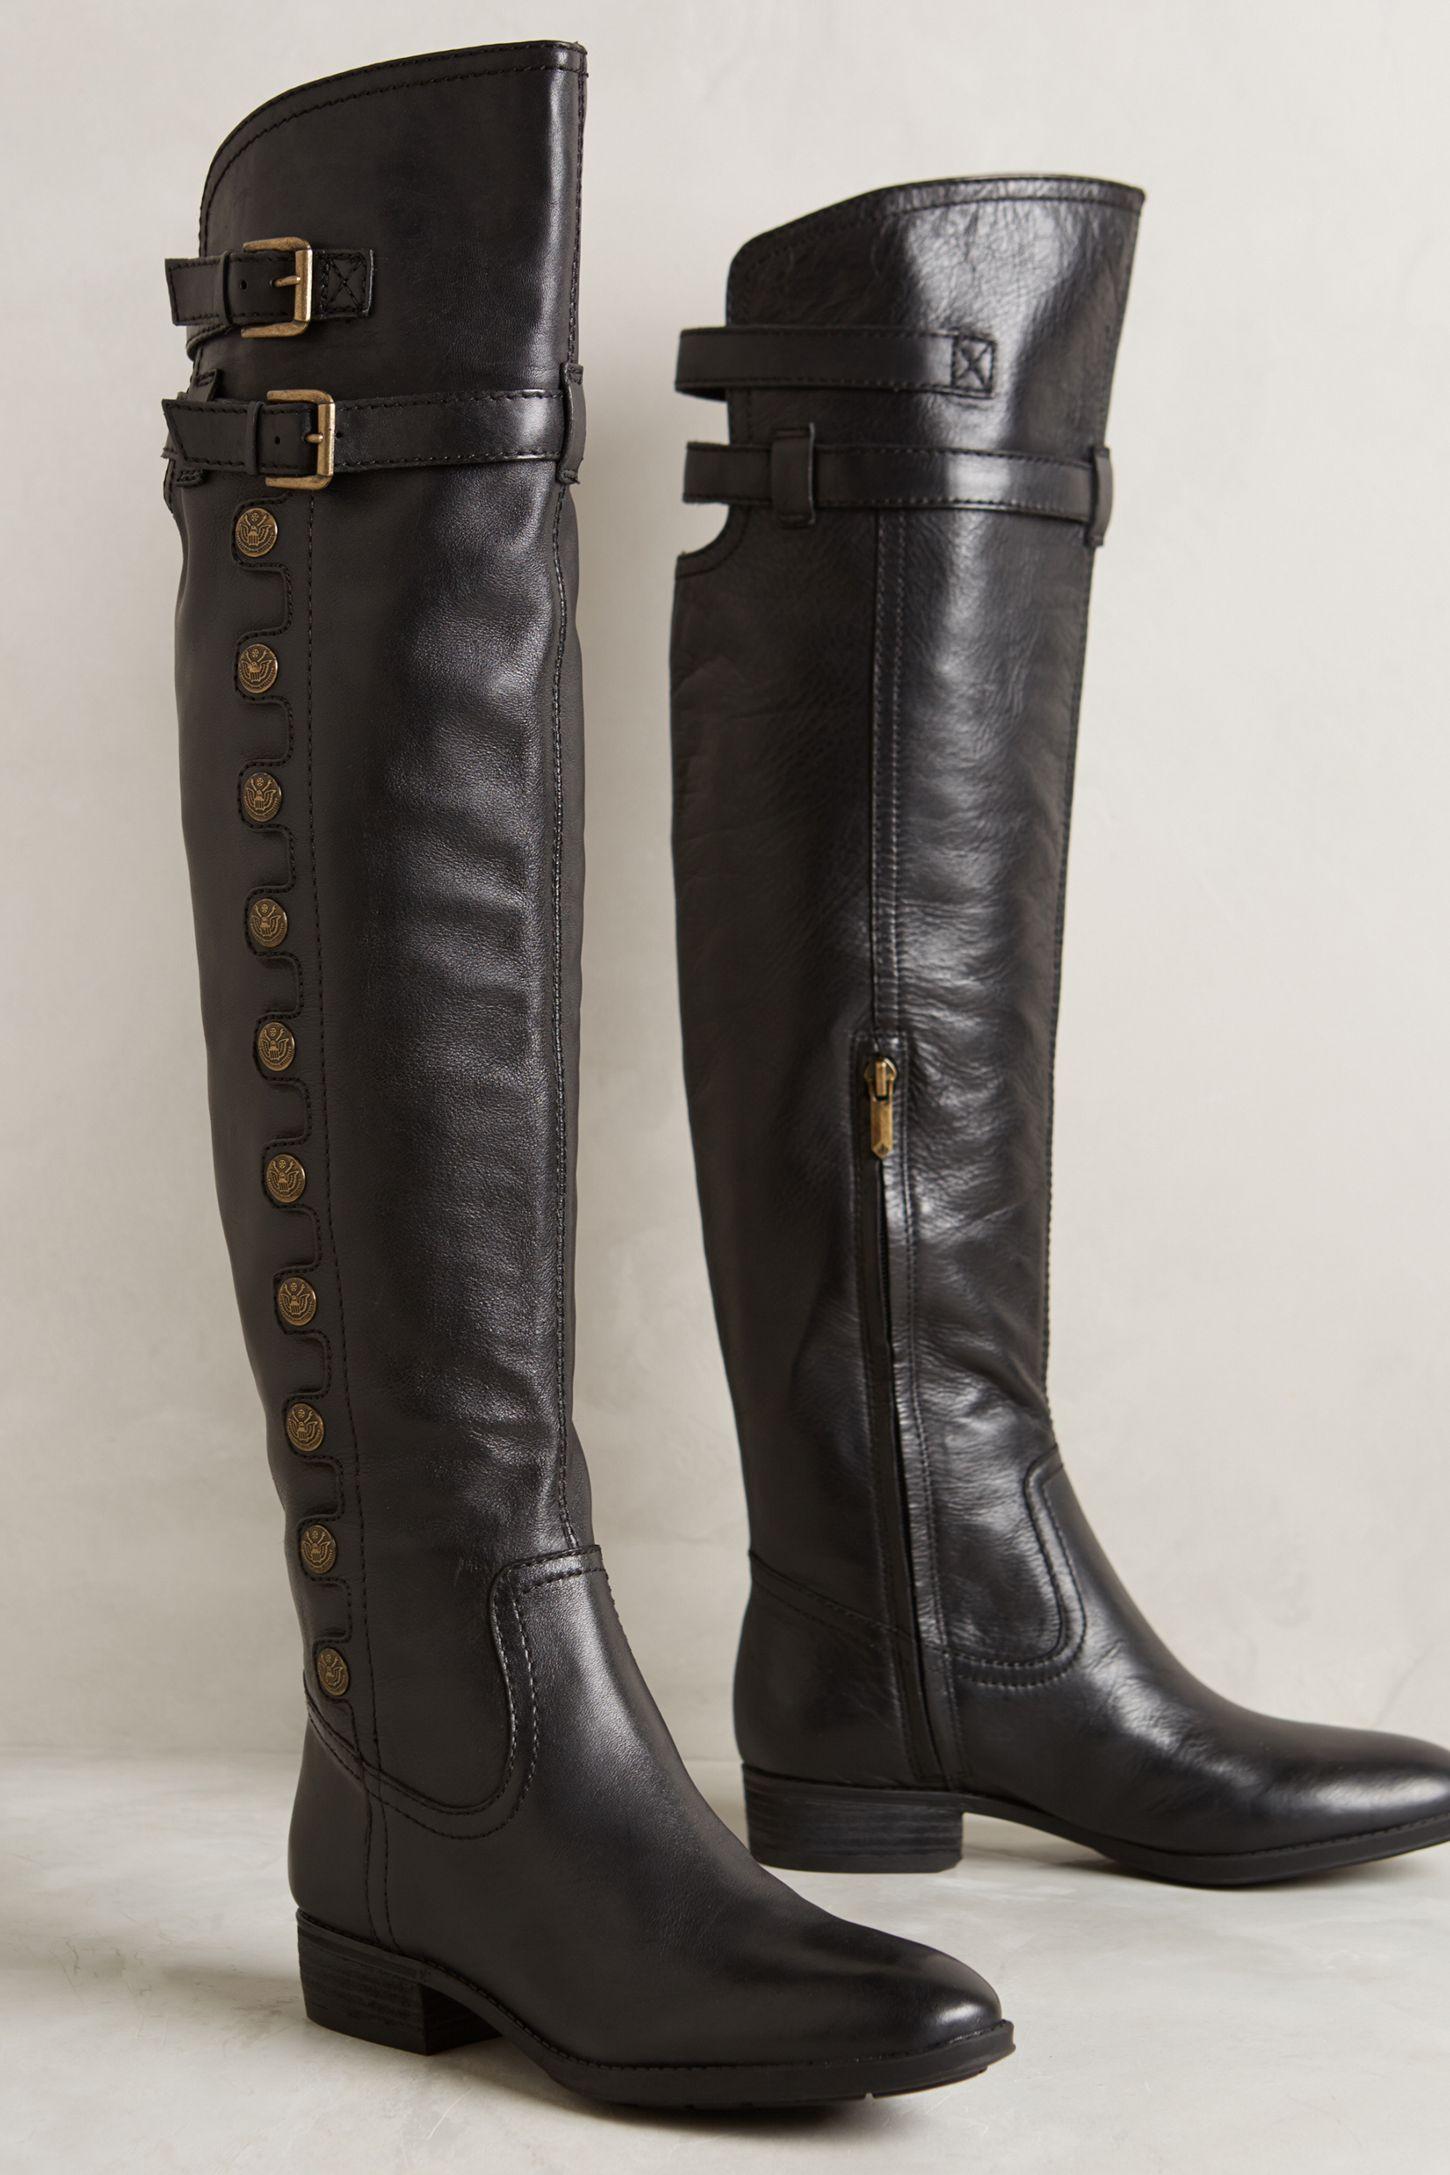 bdccf3d45d9 Sam Edelman Pierce Boots